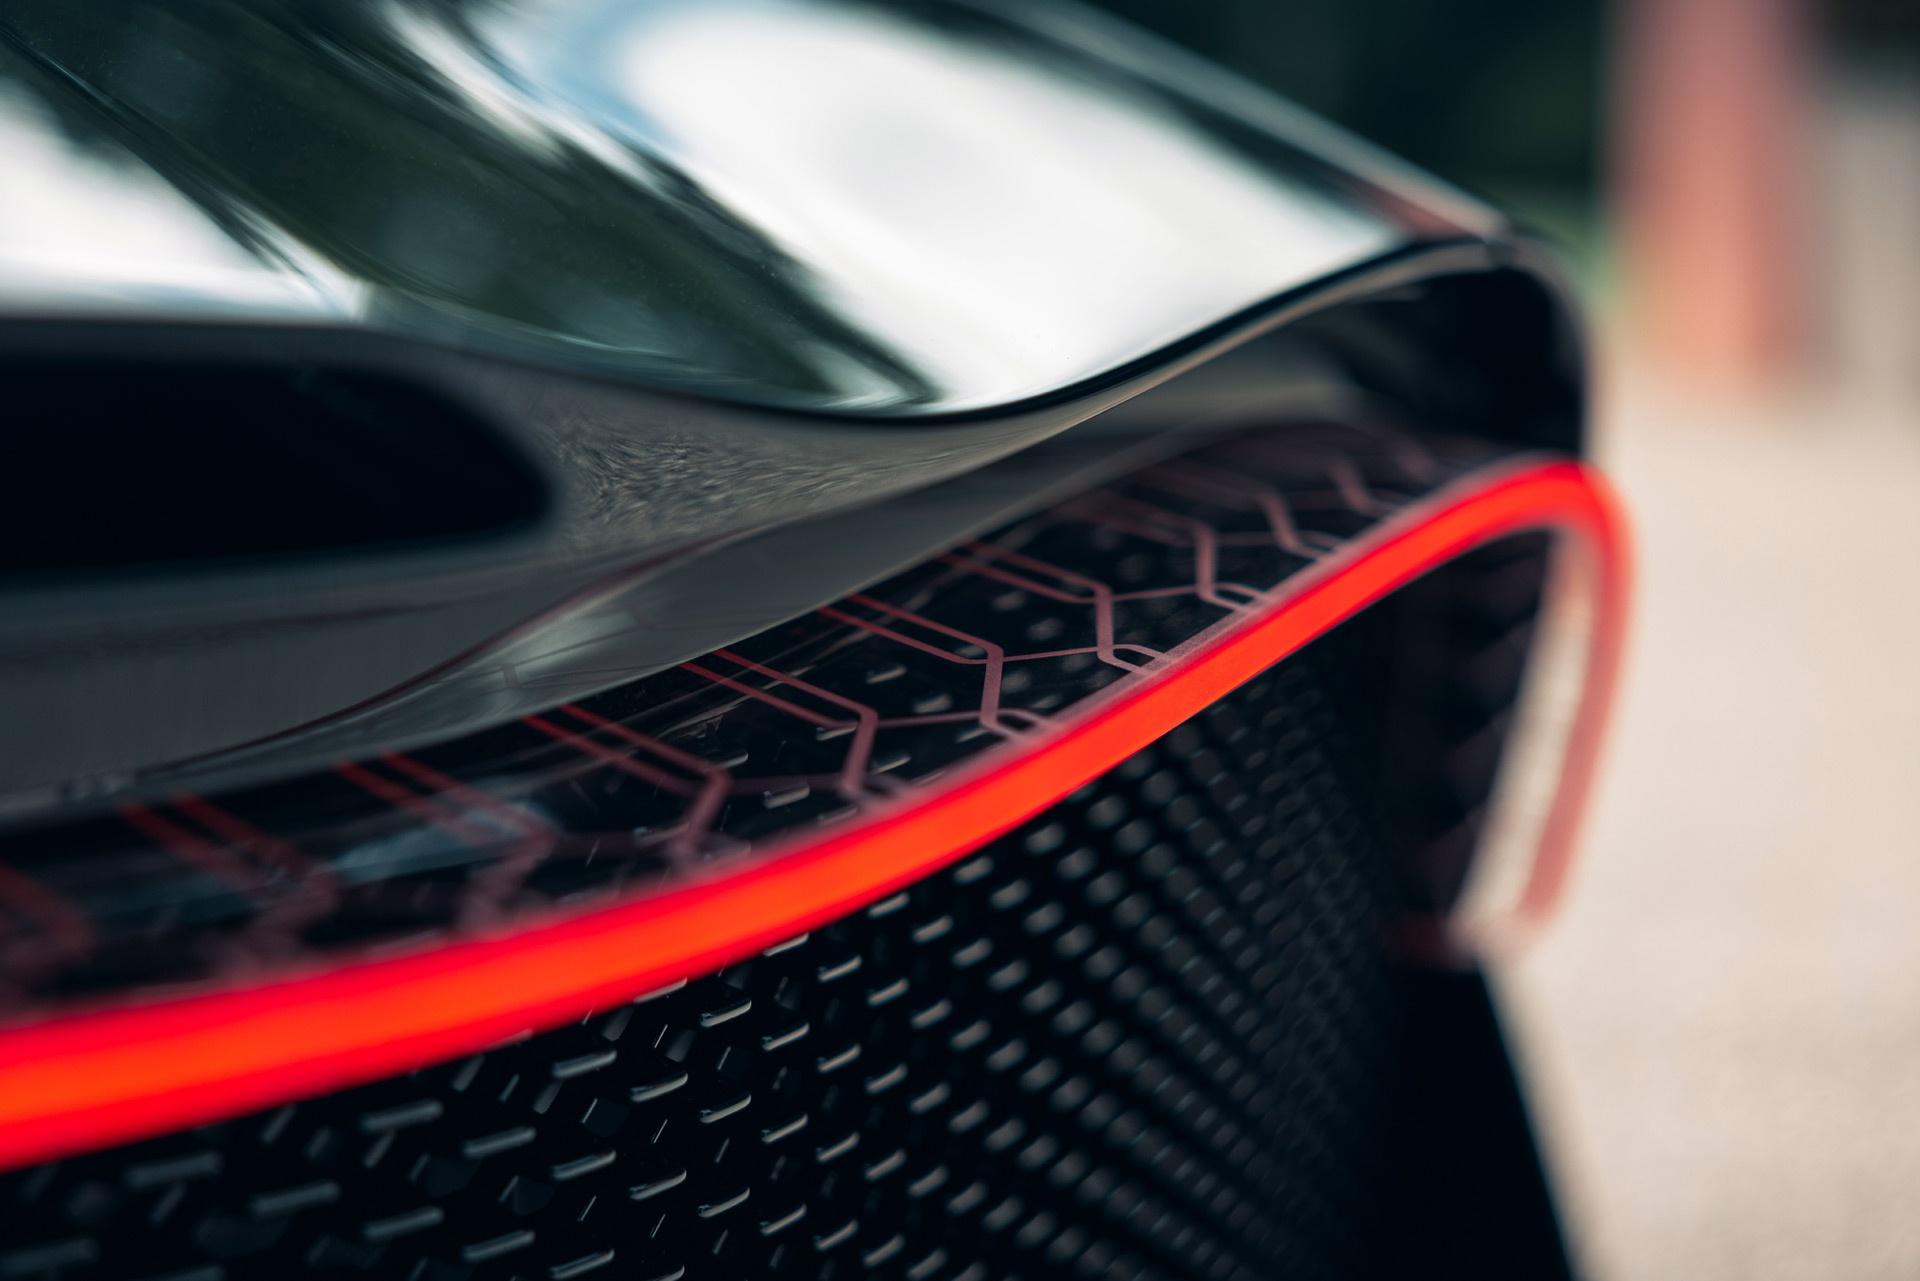 Bugatti La Voiture Noire duoc giao cho khach hang anh 9